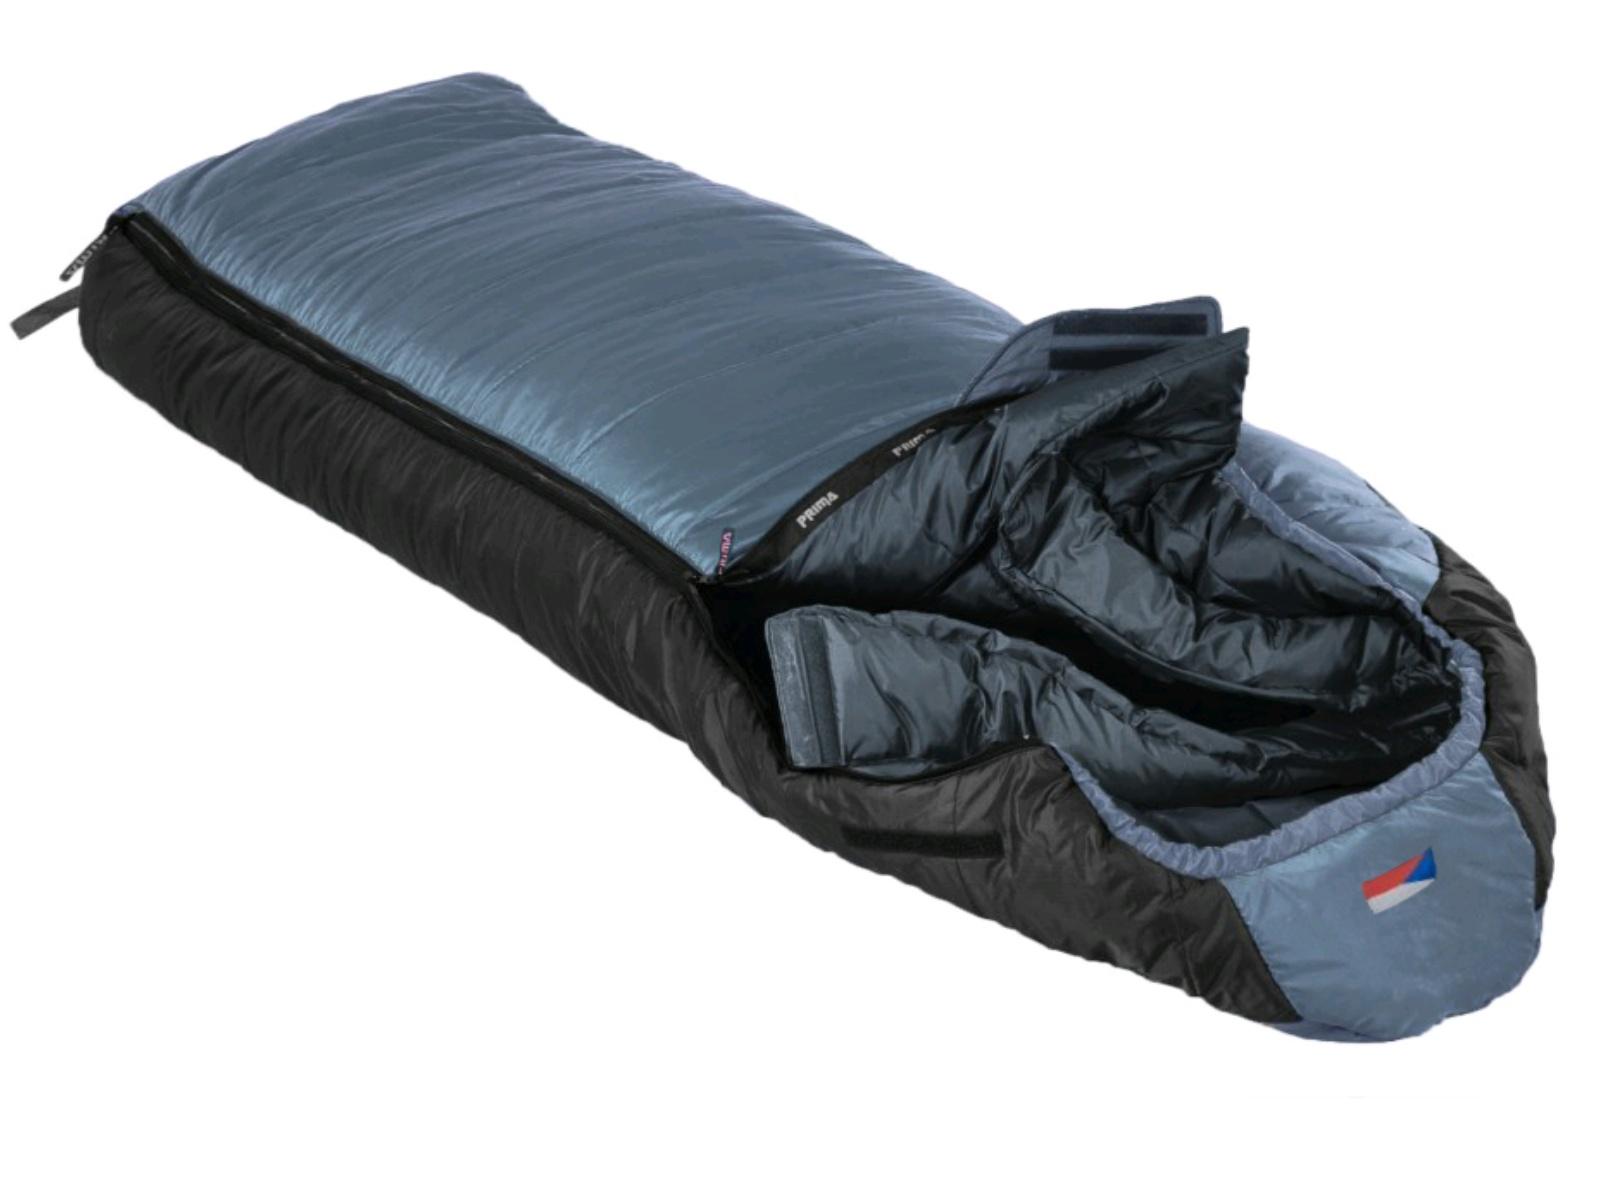 Spací vak PRIMA Manaslu 230 Comfortable šedý - ľavý zips